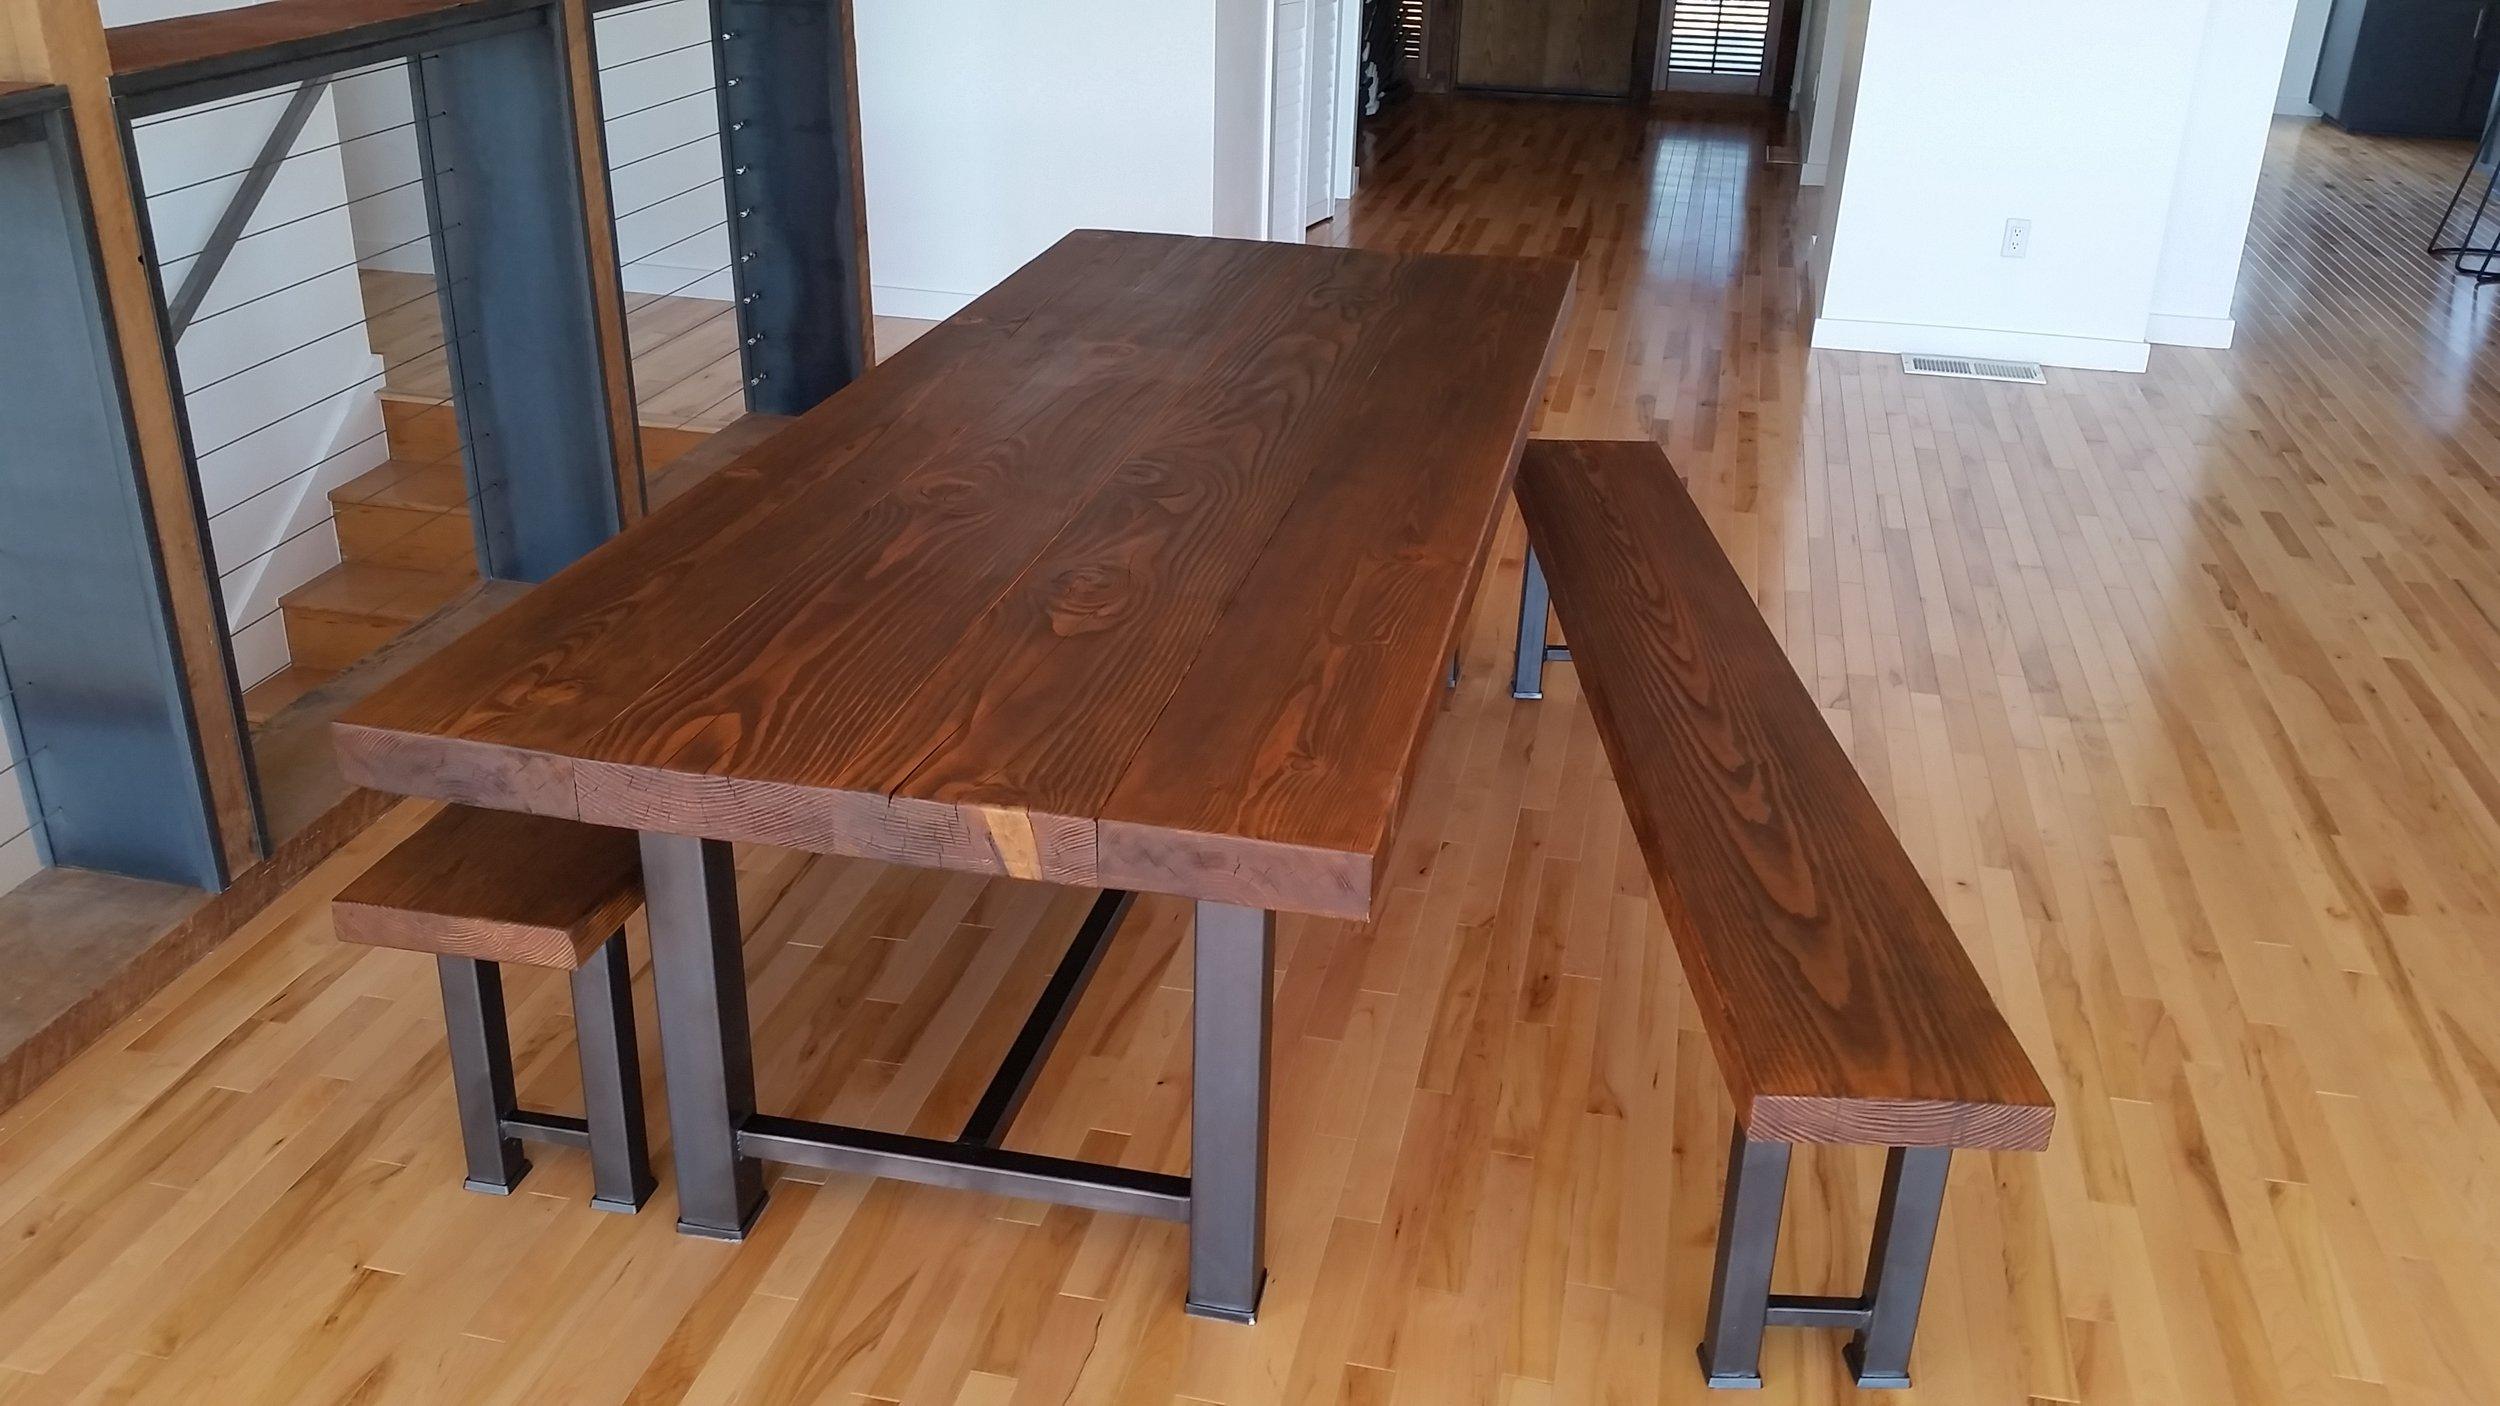 Dining room table set, textured doug fir top, steel base.